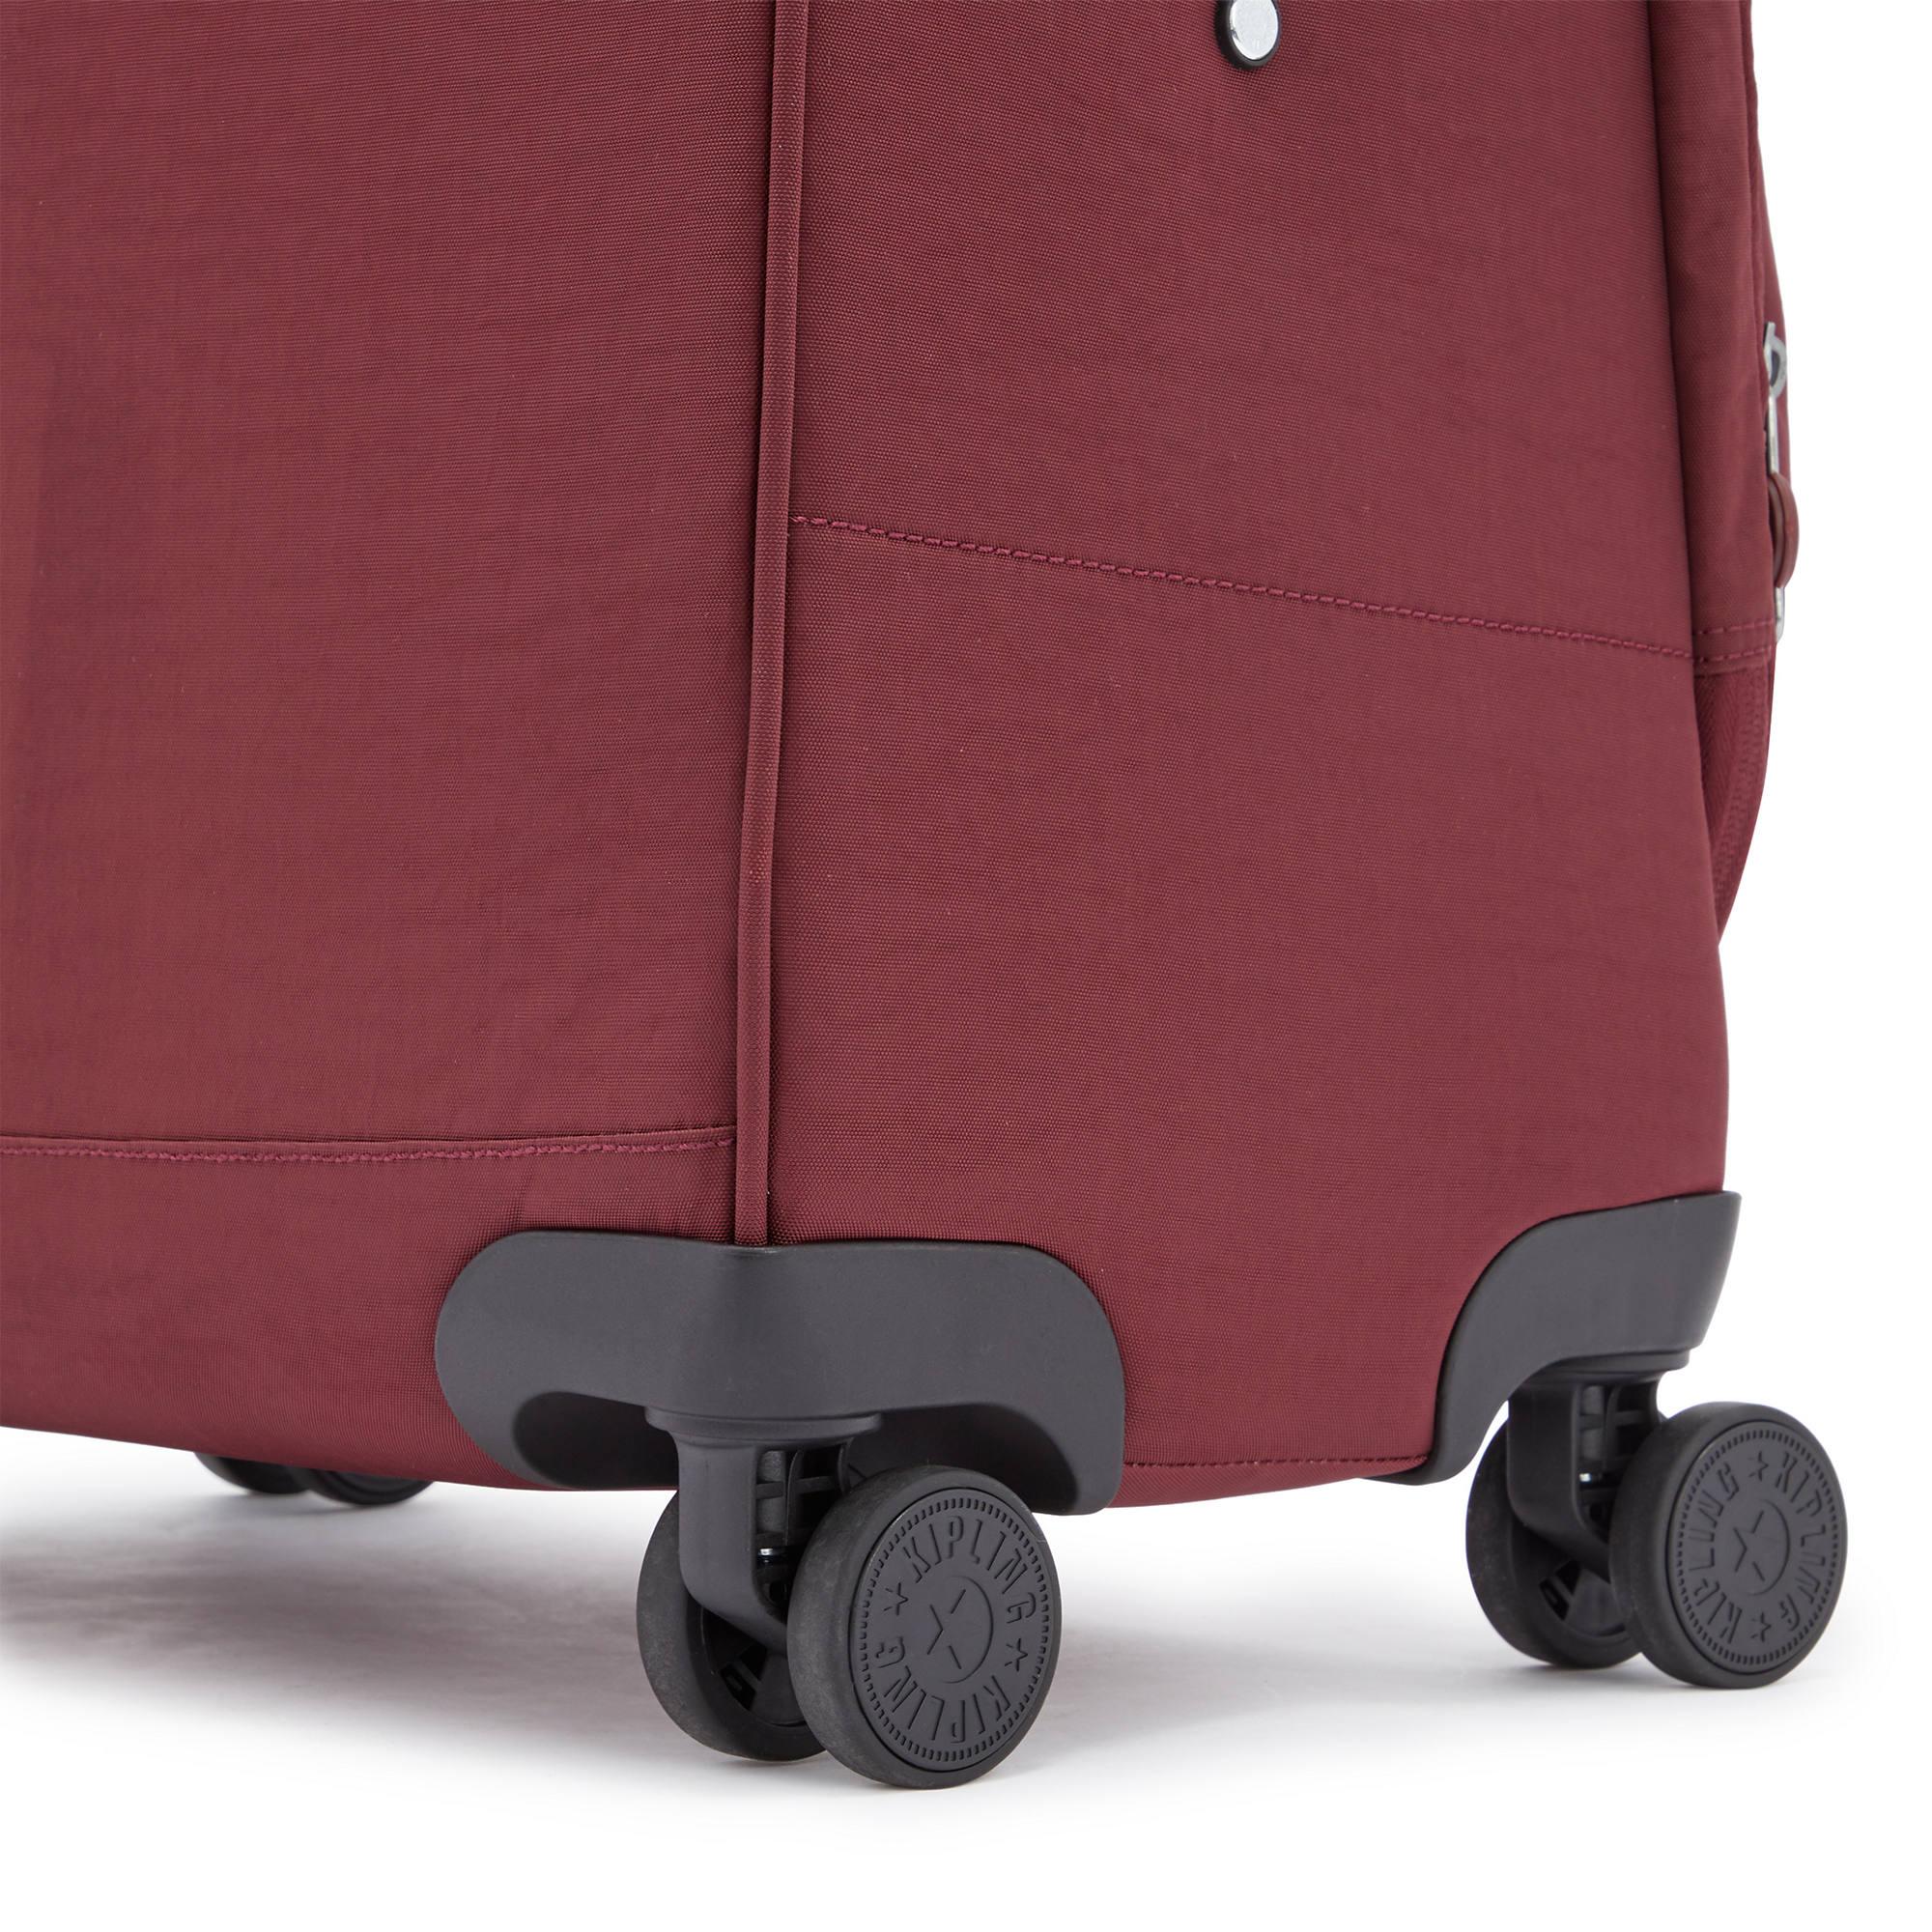 thumbnail 17 - Kipling City Spinner Medium Rolling Luggage